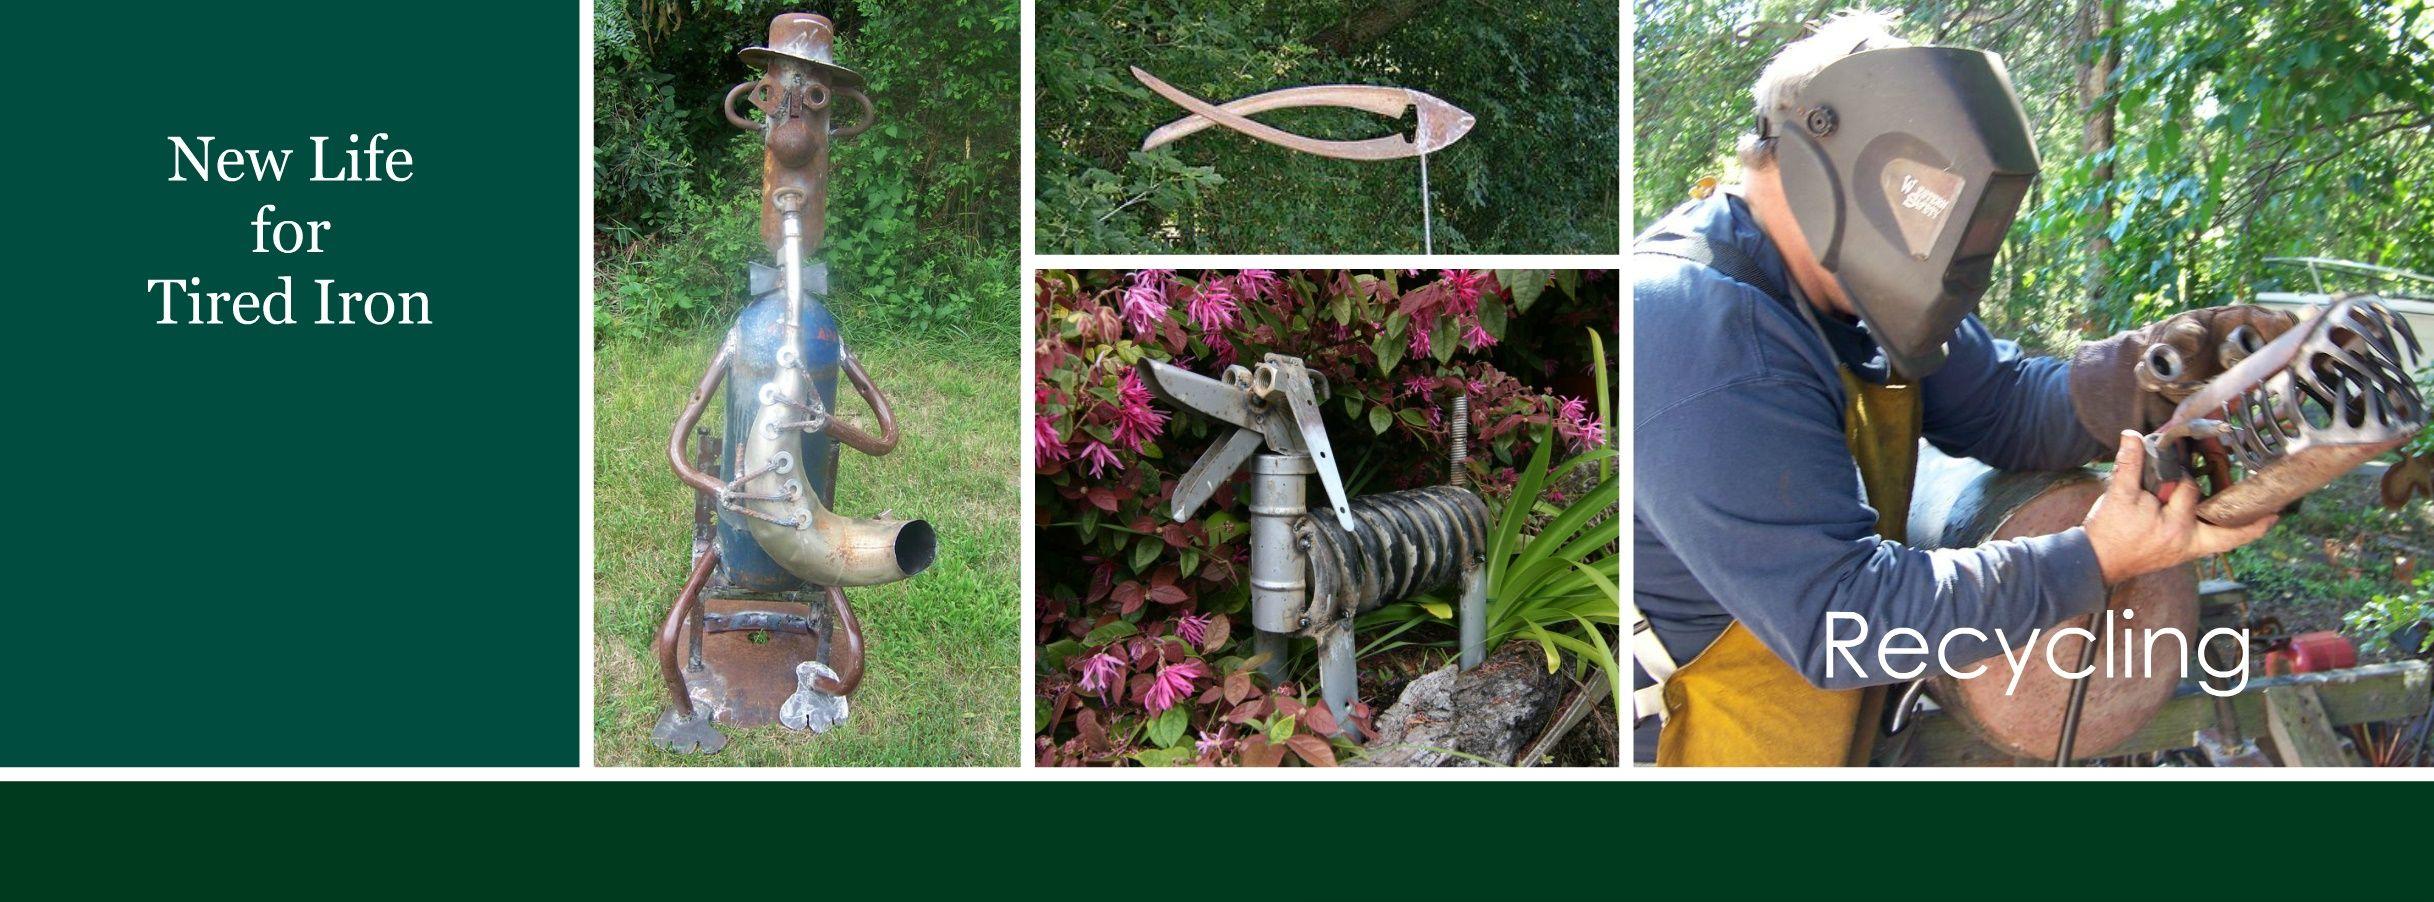 https://www.facebook.com/Rusty-Relics-Metal-Art-700605093326675/?fref=ts